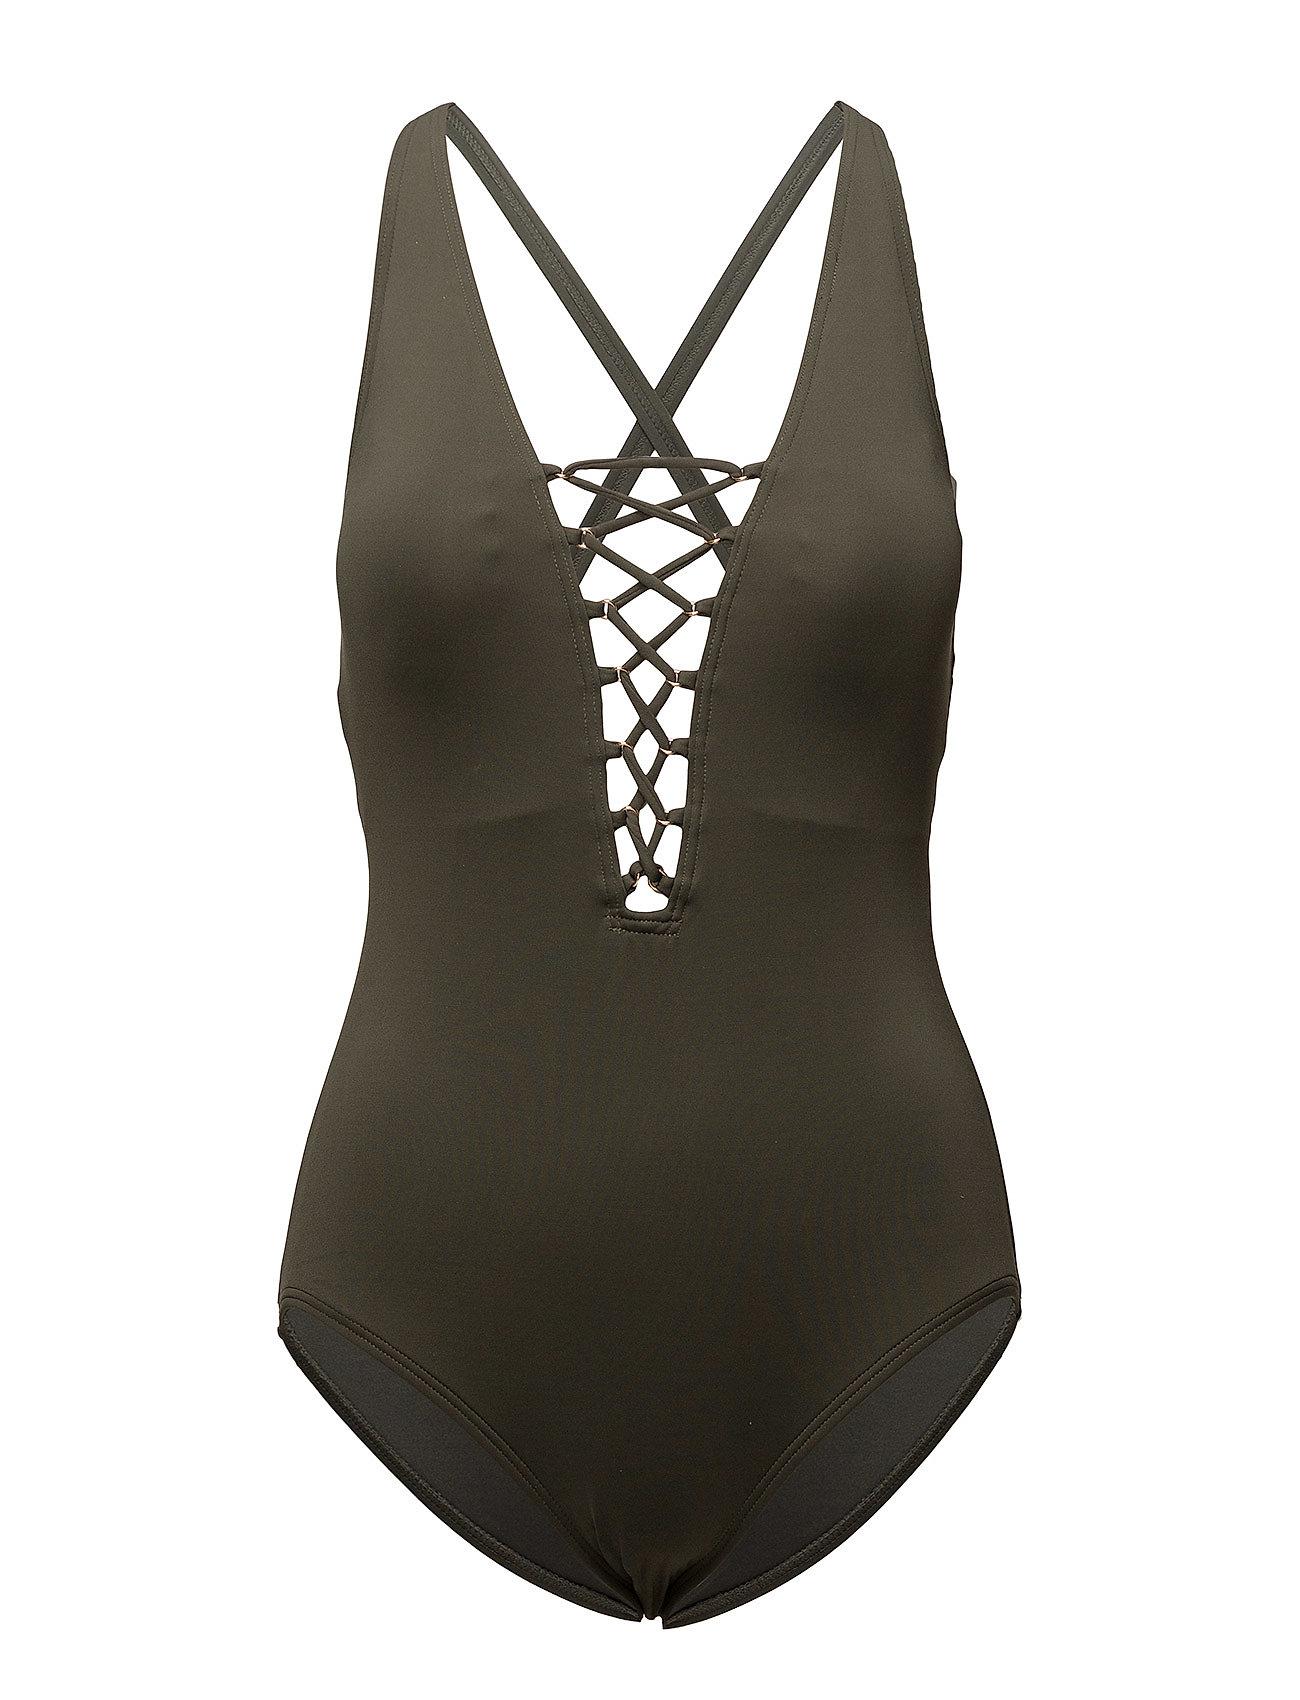 Michael Kors Swimwear X-BACK 1PCS